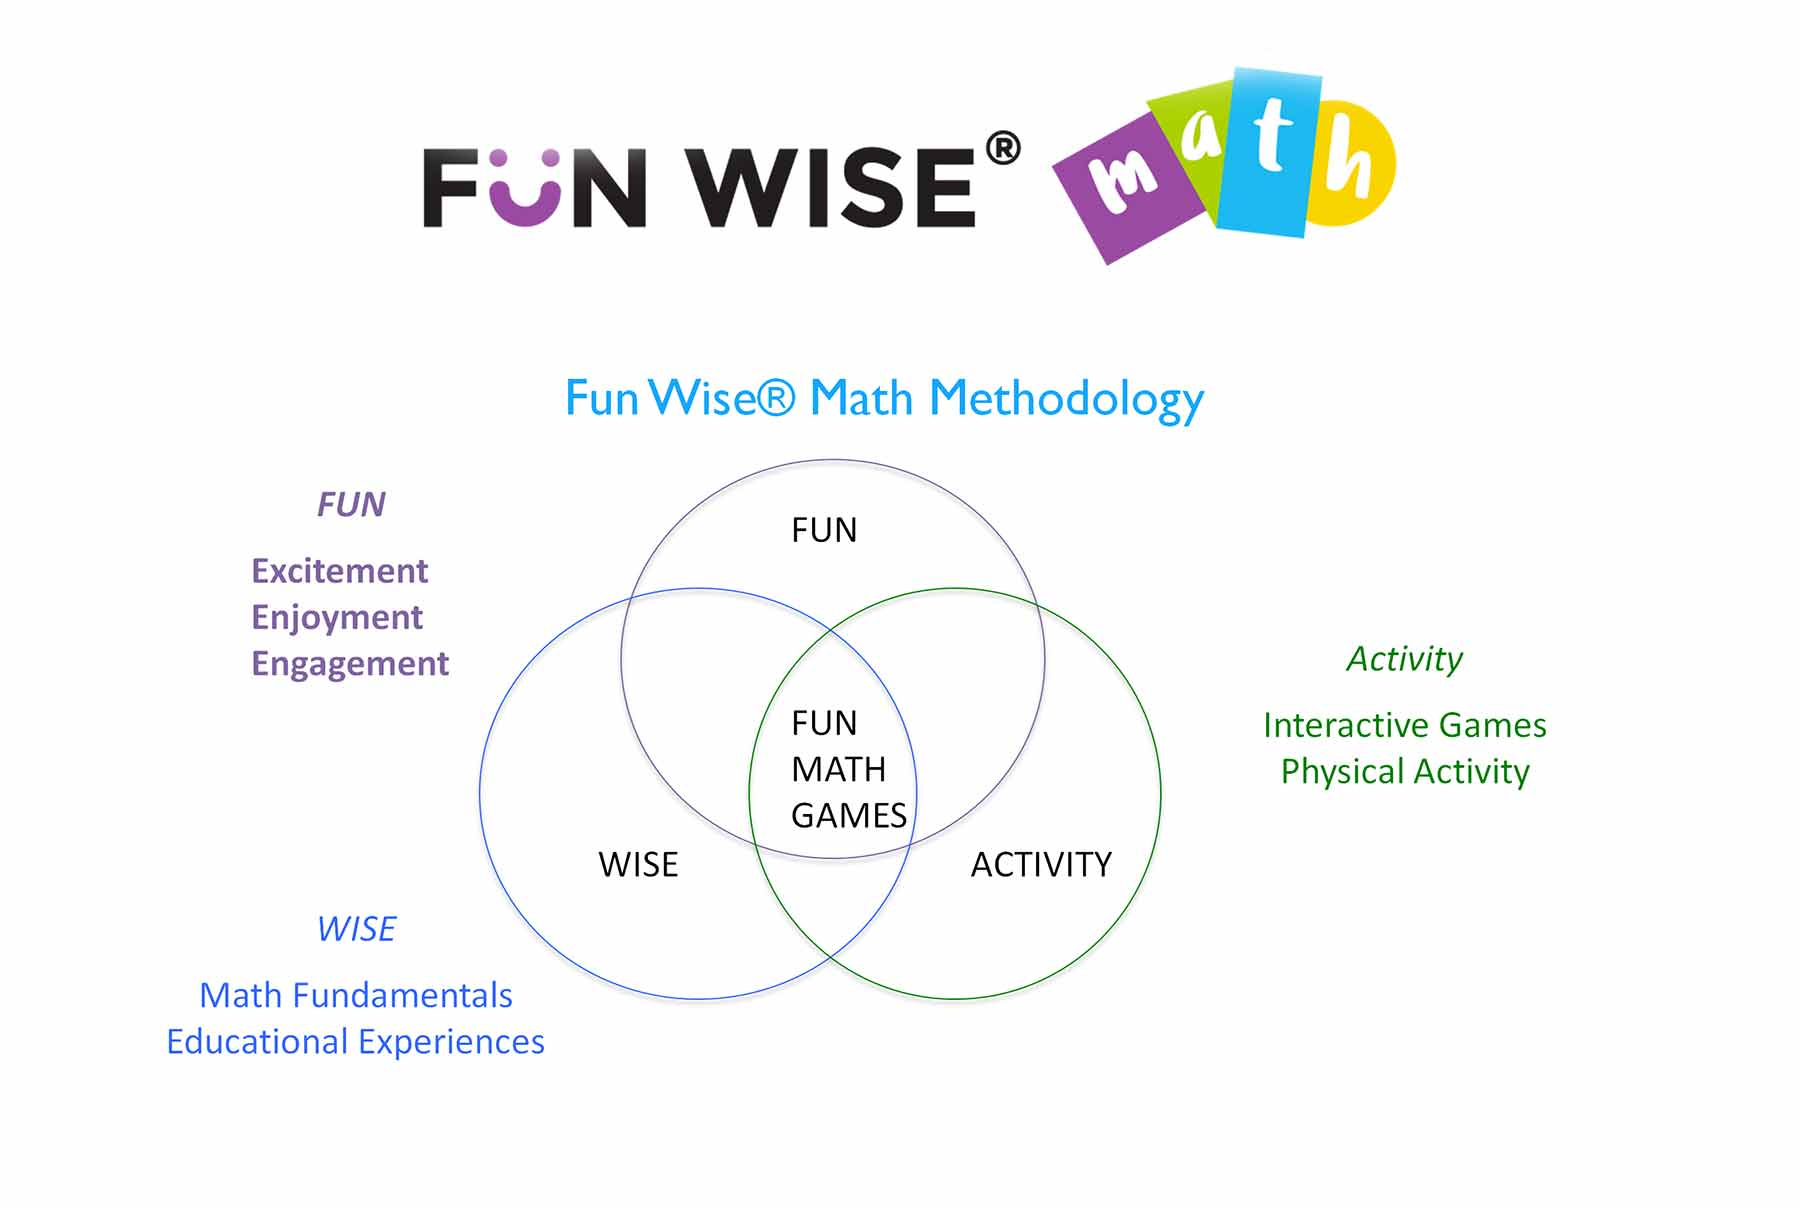 Our Math Methodology